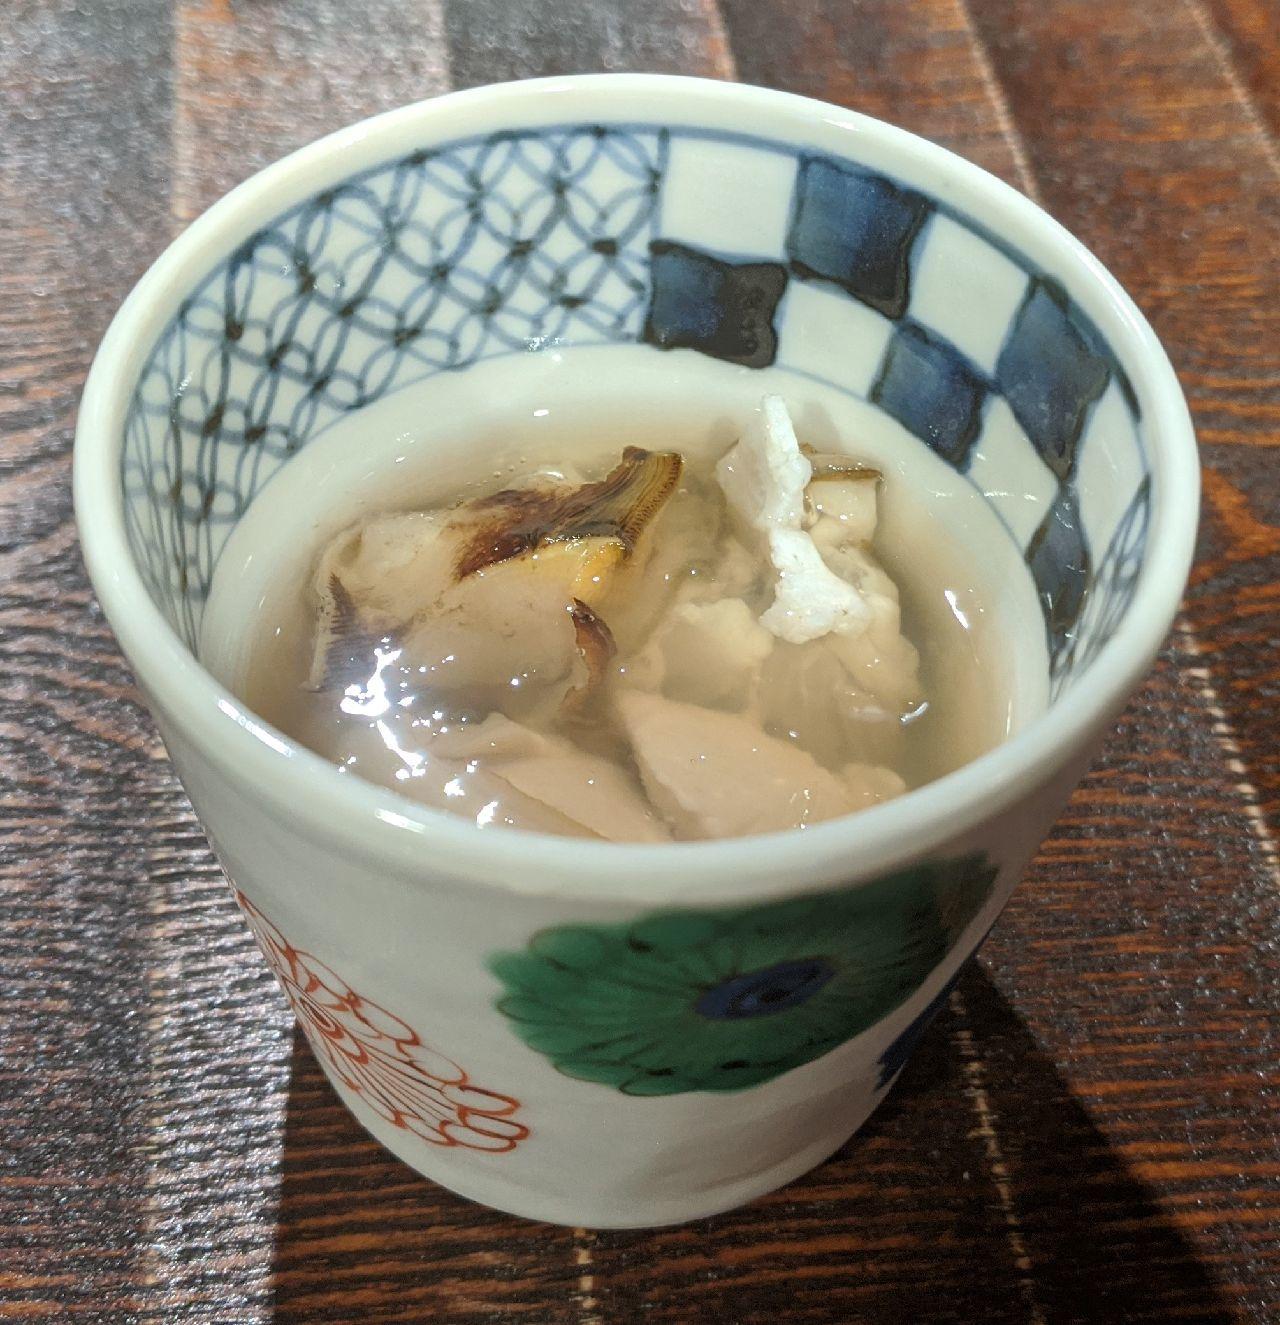 MVIMG_20200926_130328_1仙鳳趾産生牡蠣、サザエ、昆布出汁ジュレ